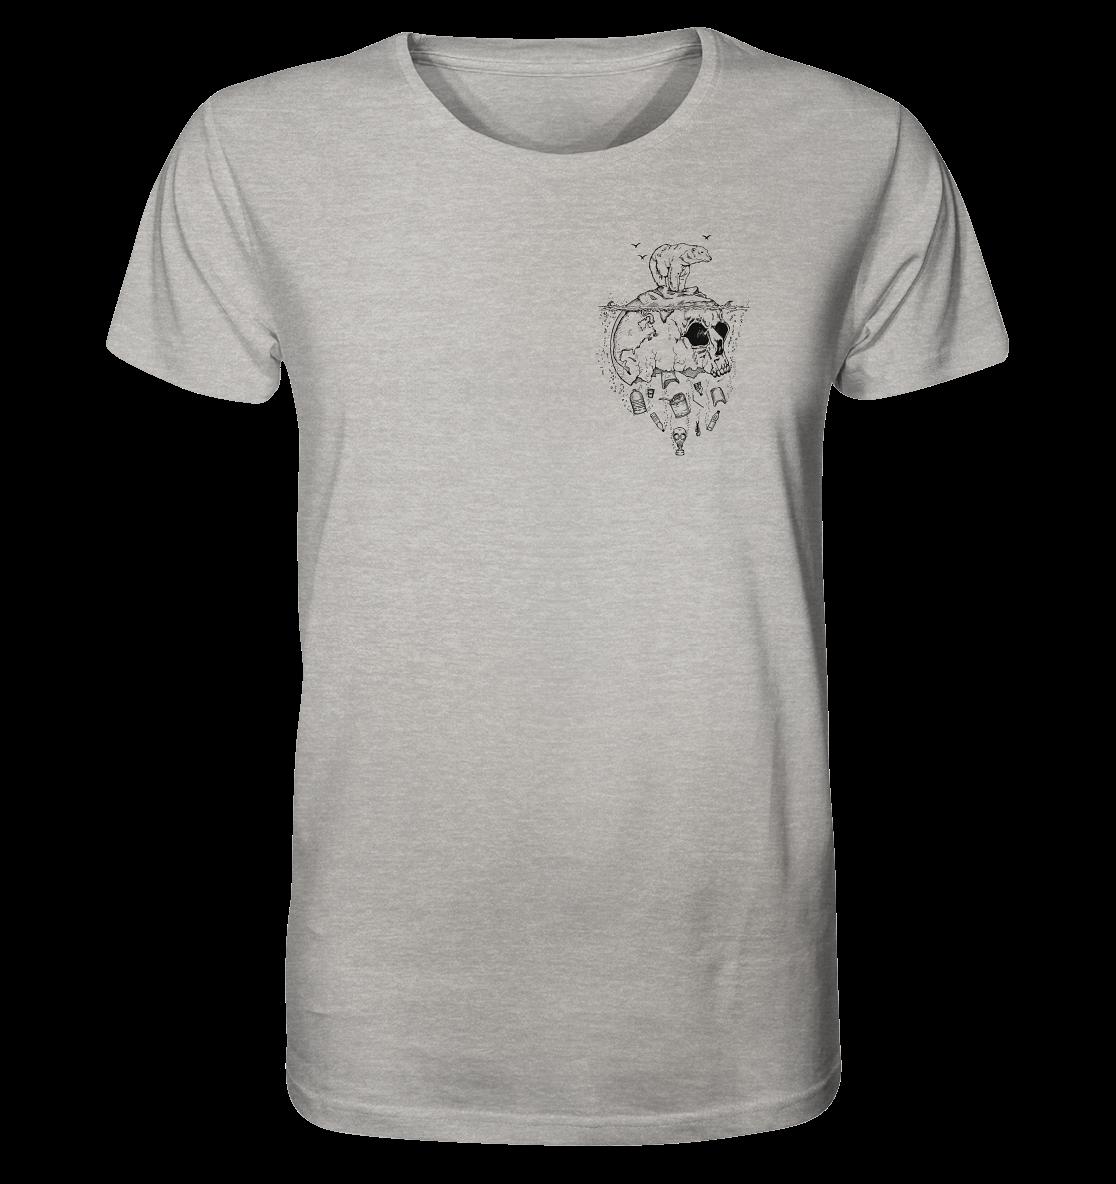 front-organic-shirt-meliert-c2c1c0-1116x-20.png